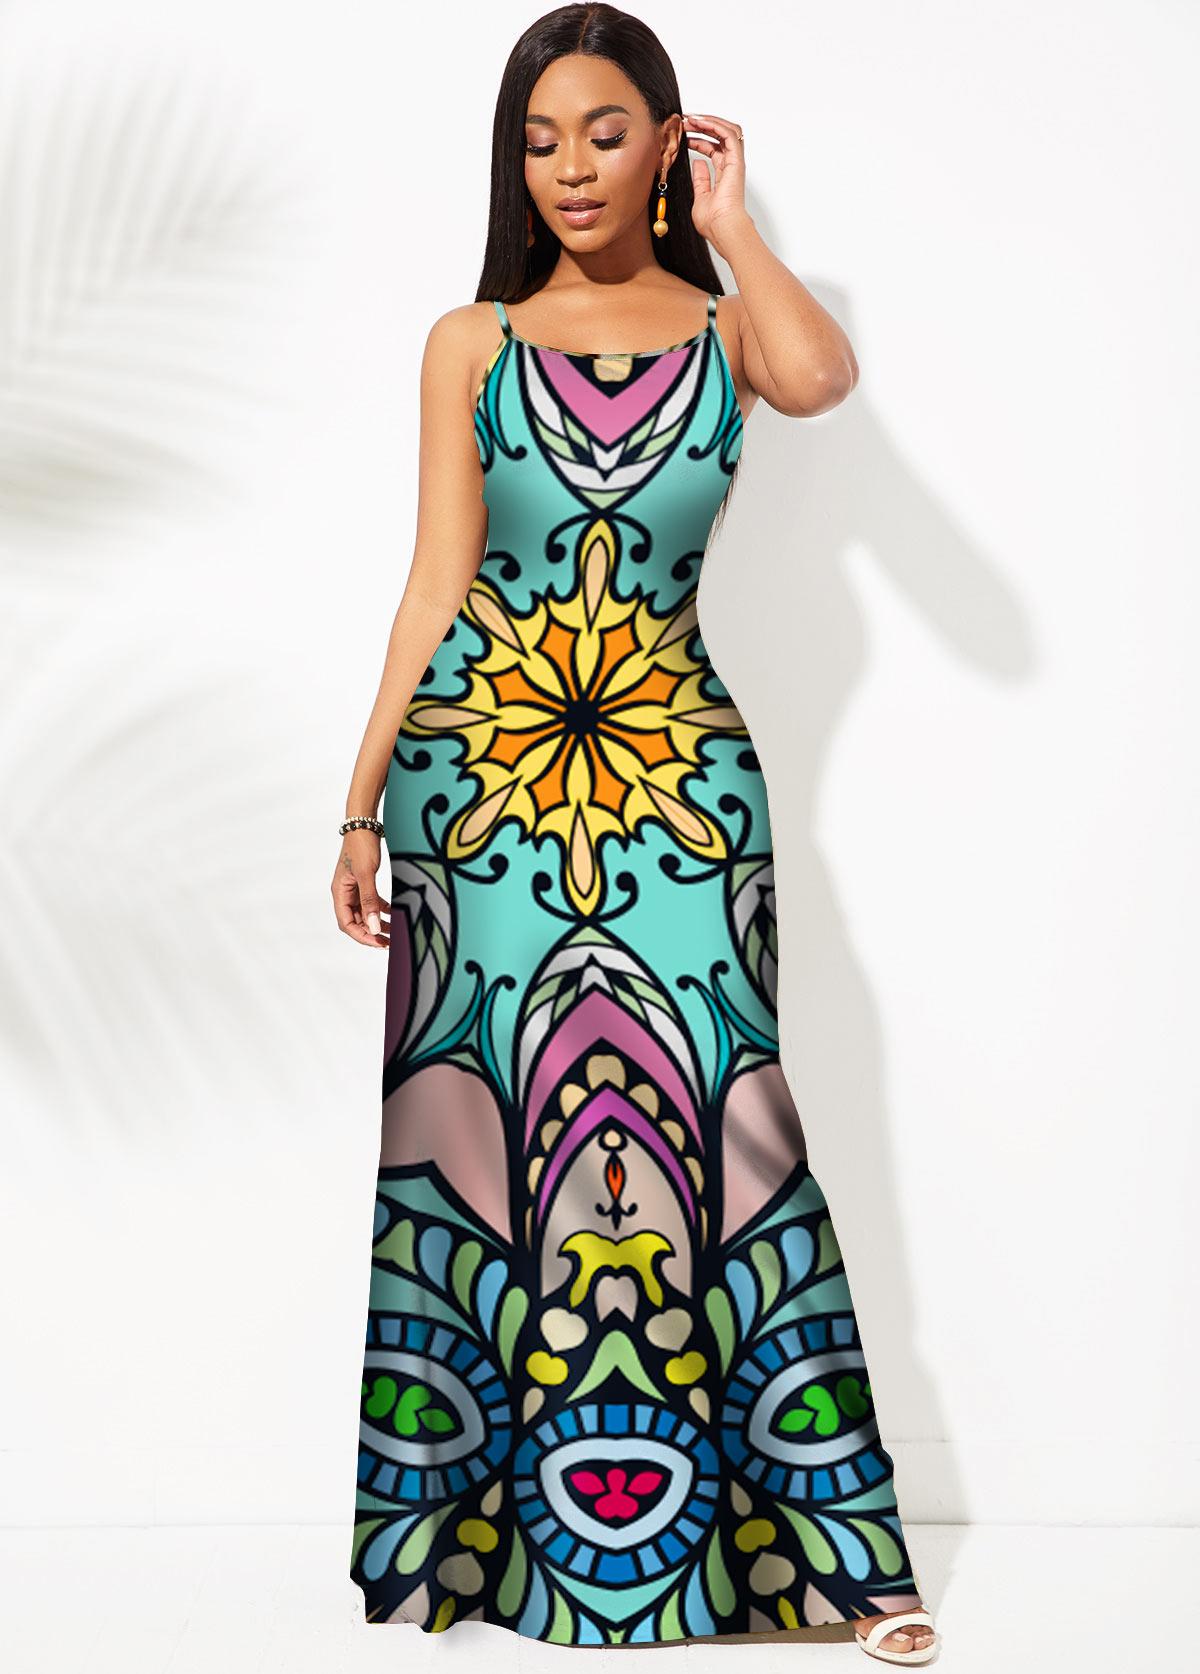 ROTITA Tribal Print Spaghetti Strap Mermaid Dress